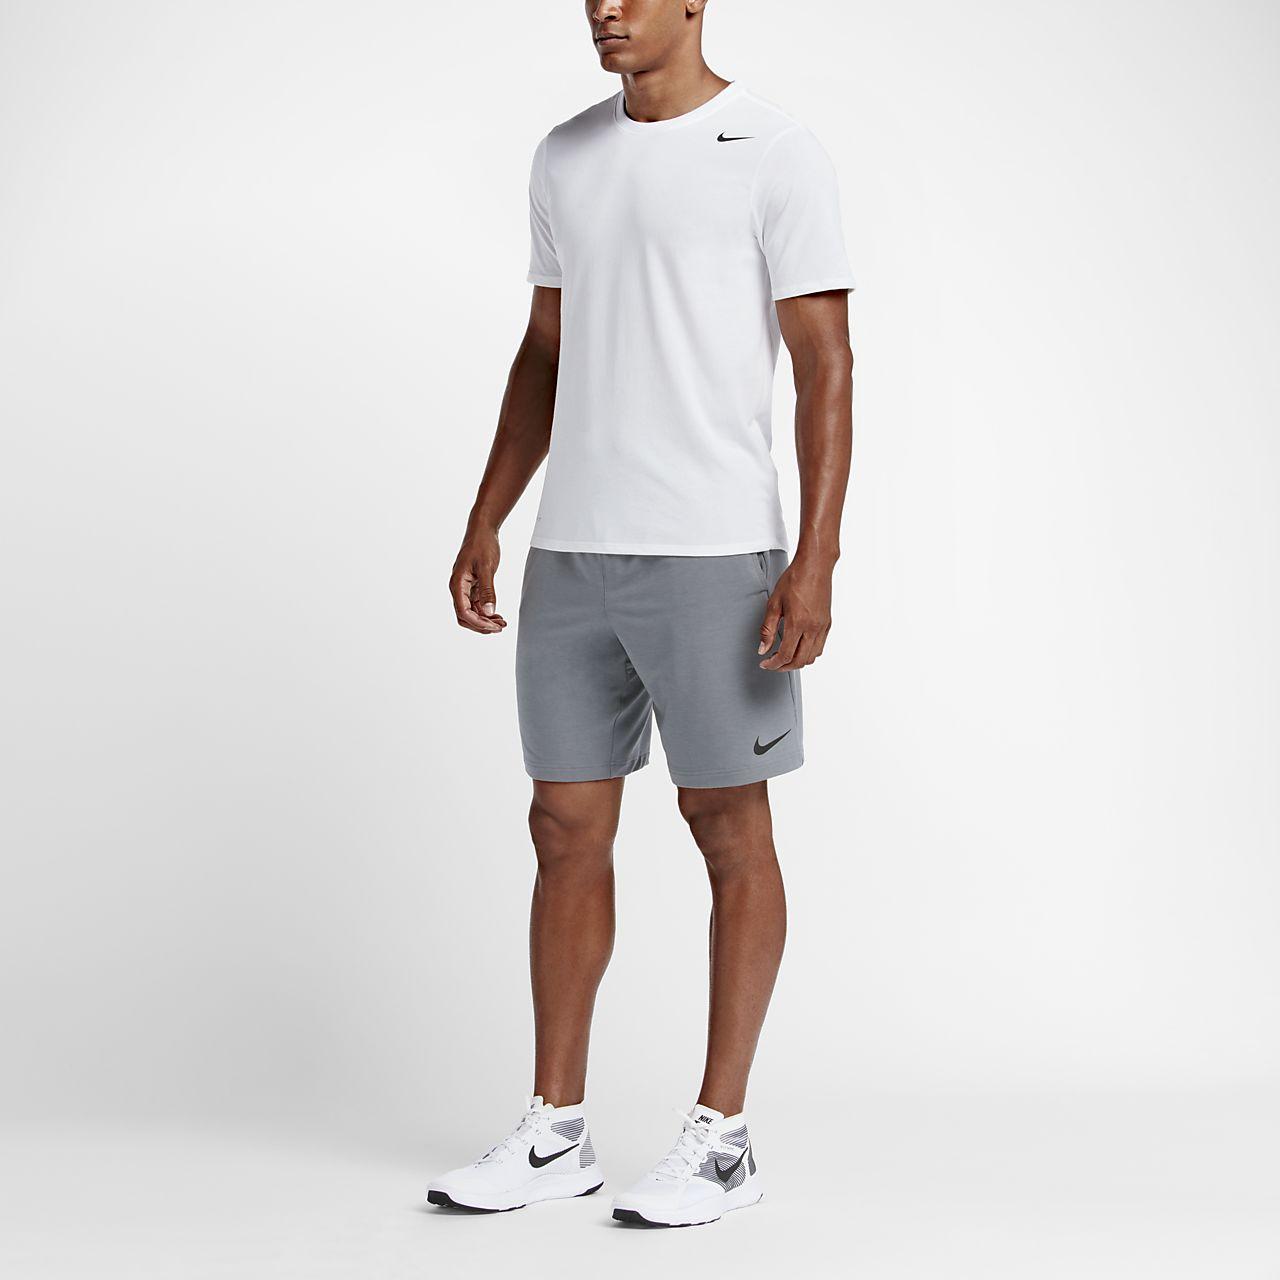 863195b37 Nike Dri-FIT Men's Training Short-Sleeve T-Shirt. Nike.com NL